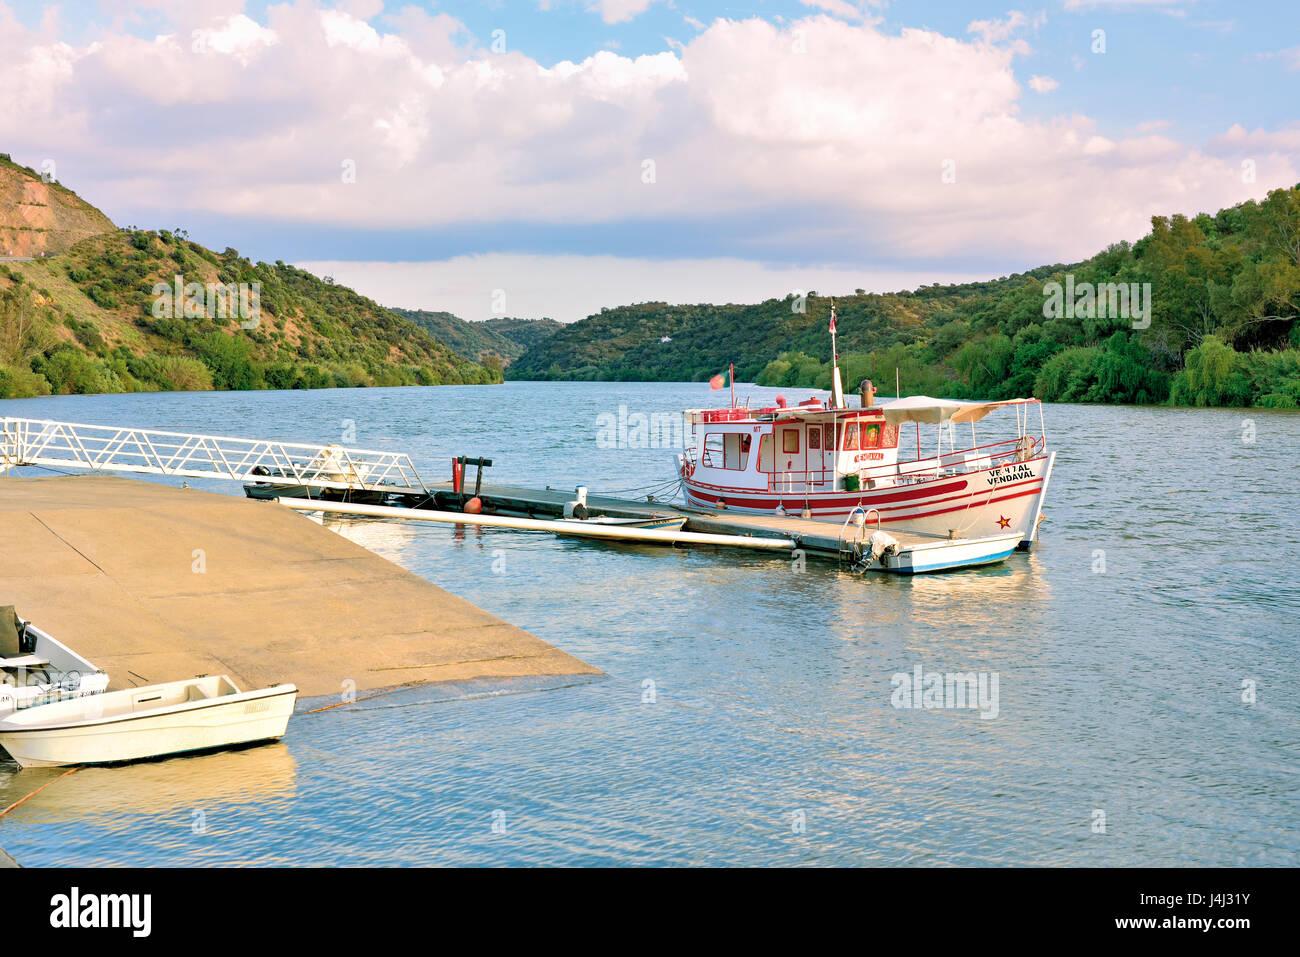 Portugal, Alentejo: Boat 'Vendaval' anchoring at quay of small riverside location Pomarao - Stock Image